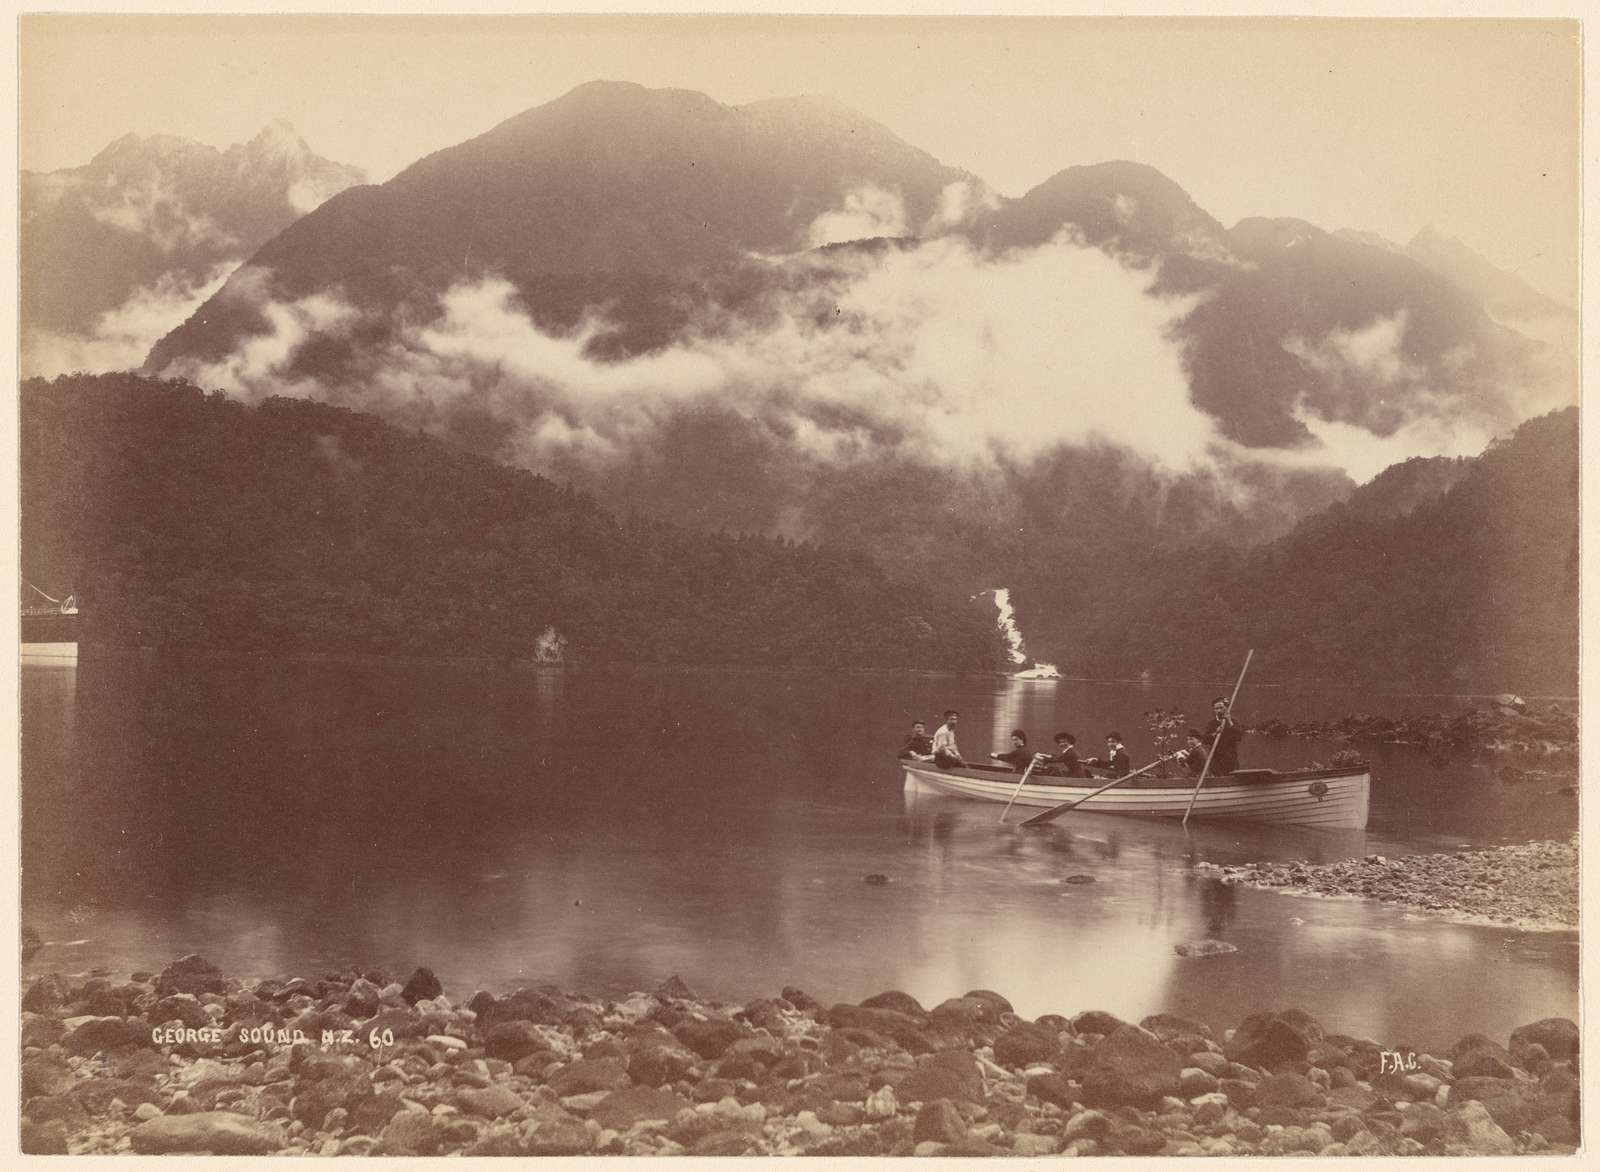 George Sound, N. Z.